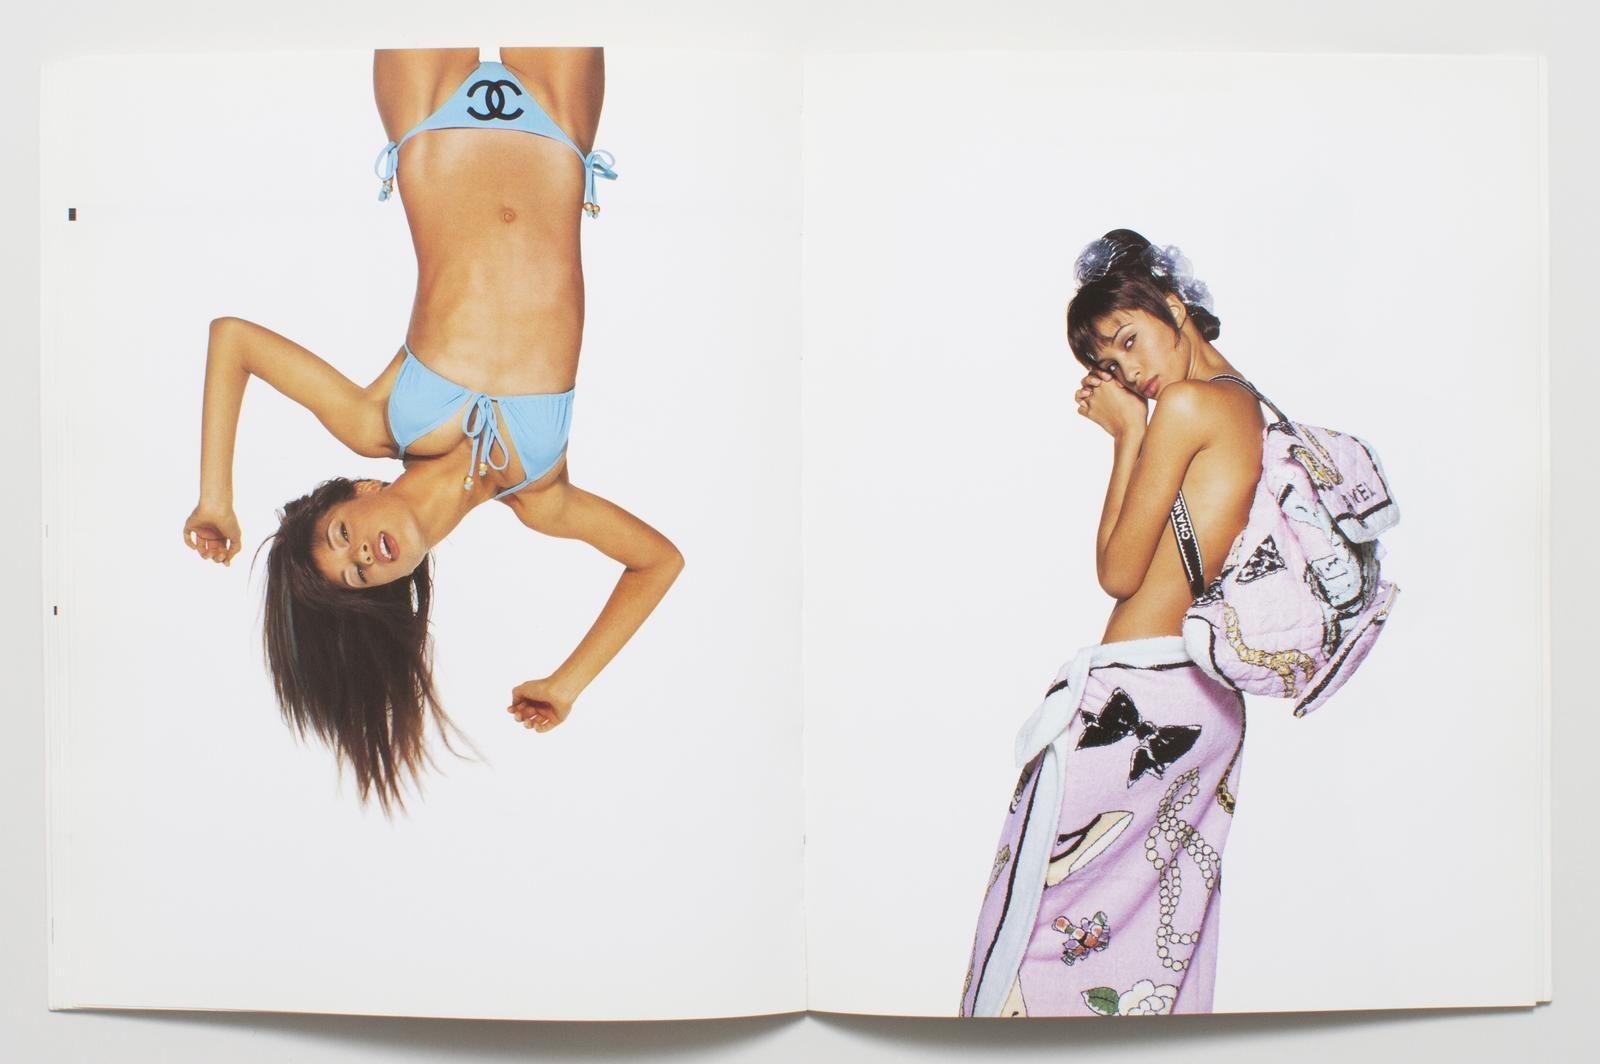 Bikini Brandi Quinones naked (74 foto and video), Sexy, Paparazzi, Instagram, butt 2006